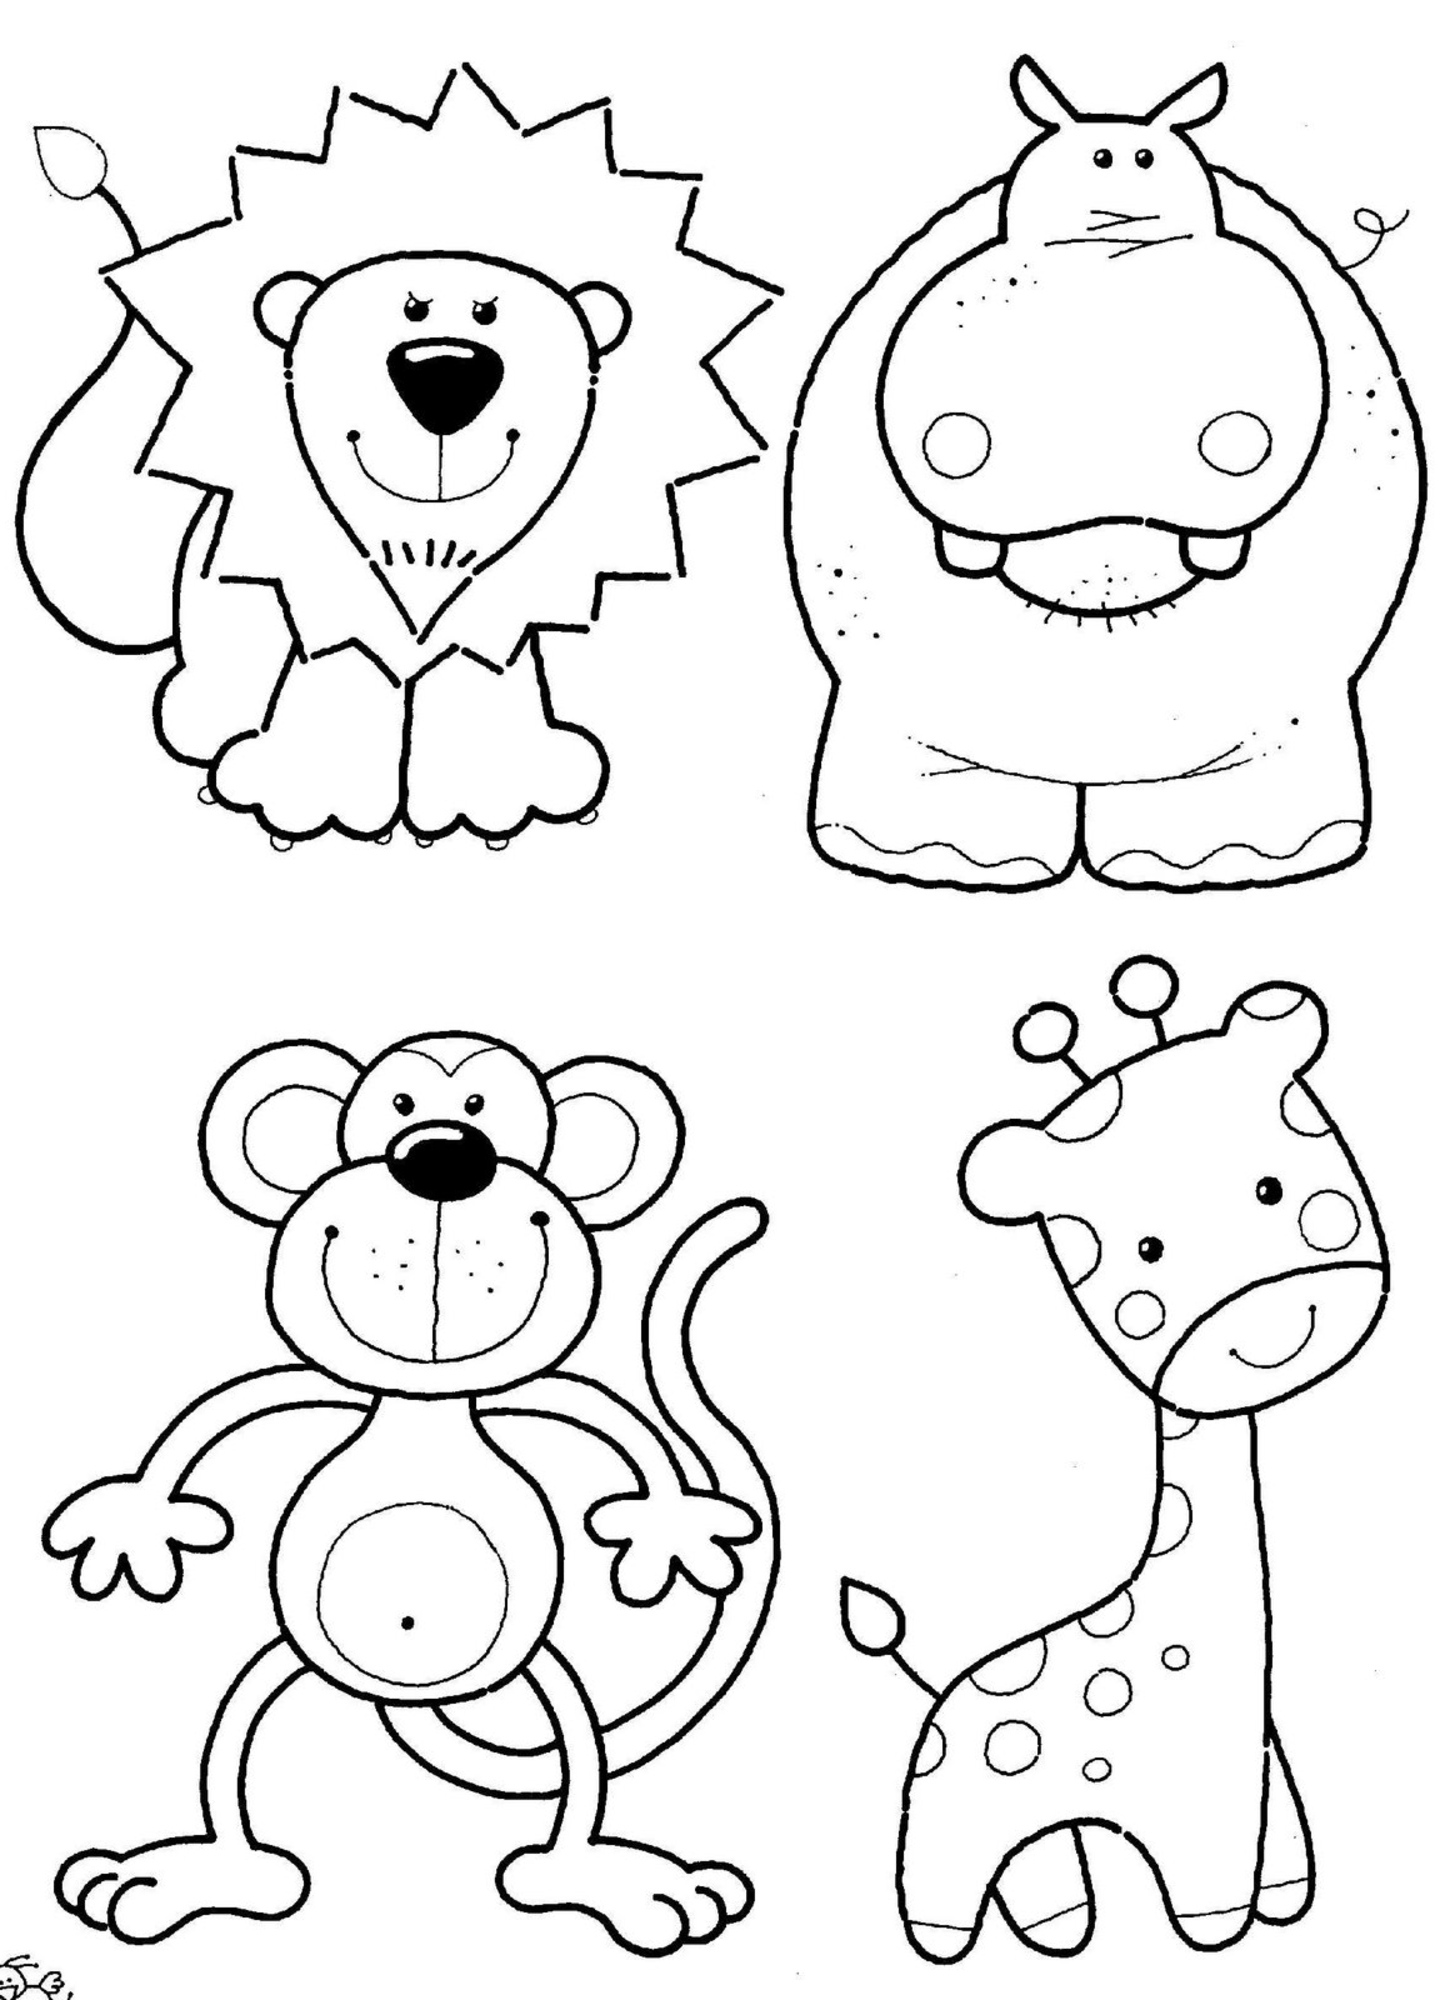 Printable coloring pages jungle - Jungle Safari Coloring Pages